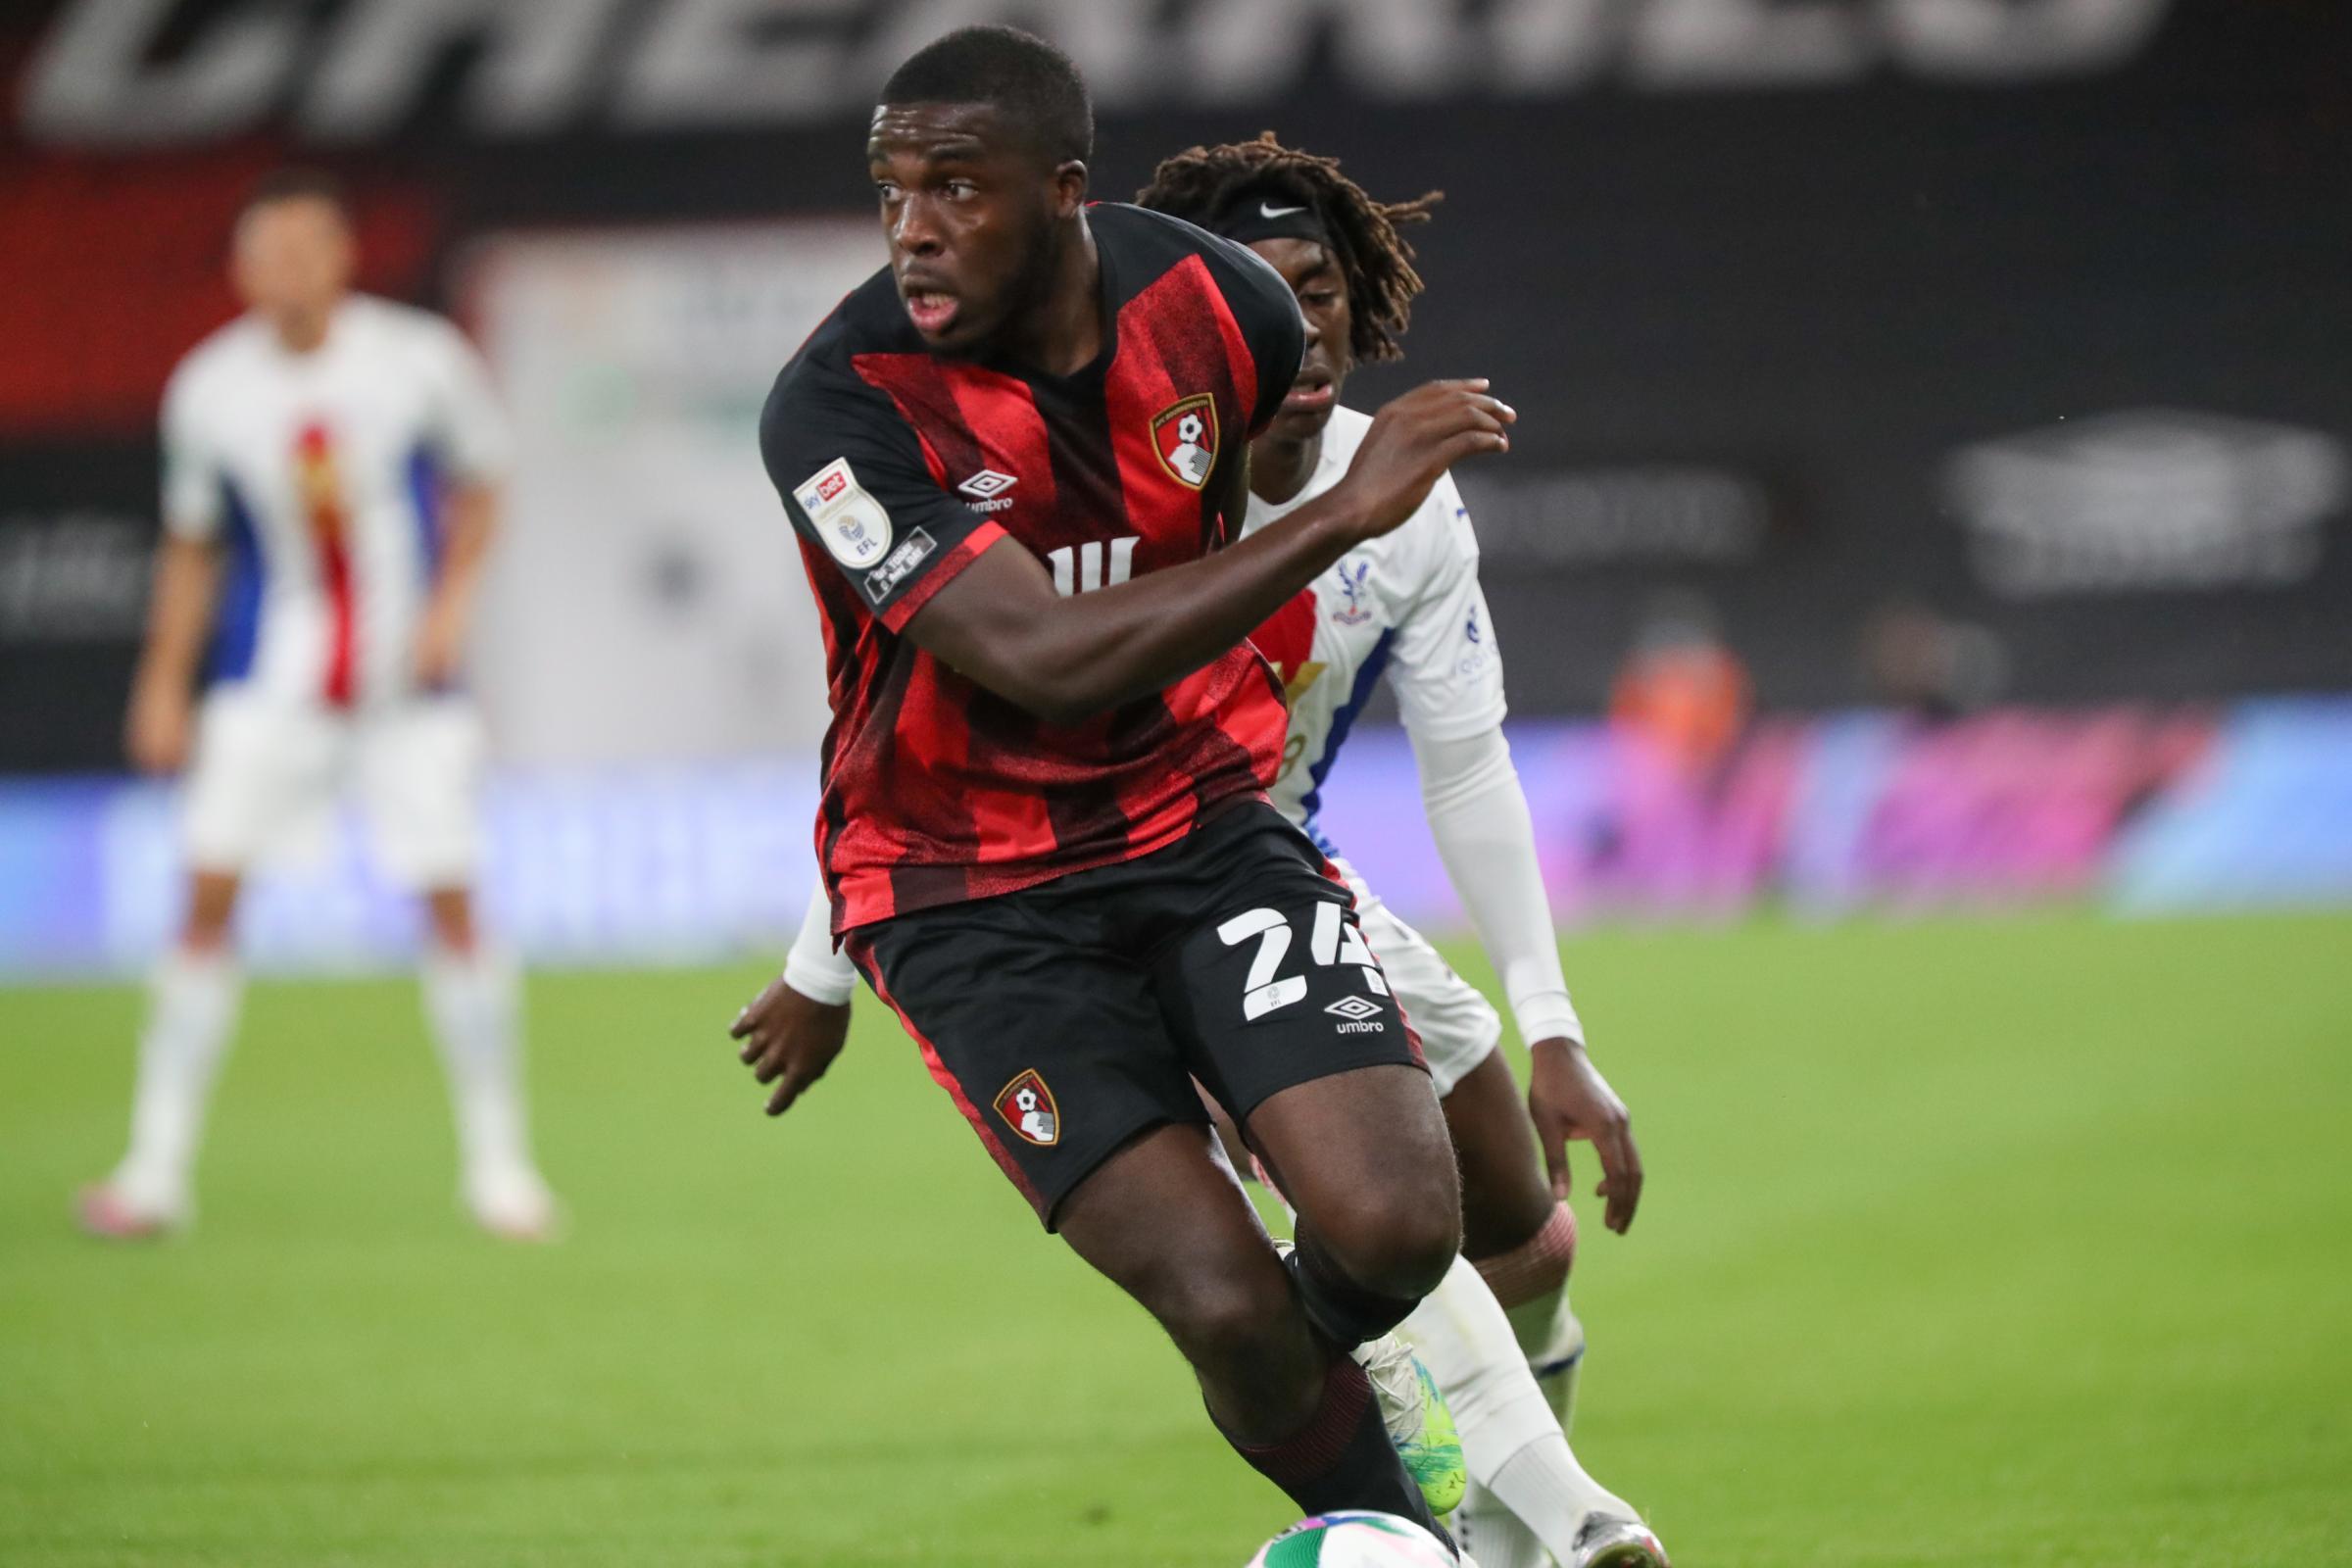 Charlton reportedly interested in Cherries midfielder Ofoborh